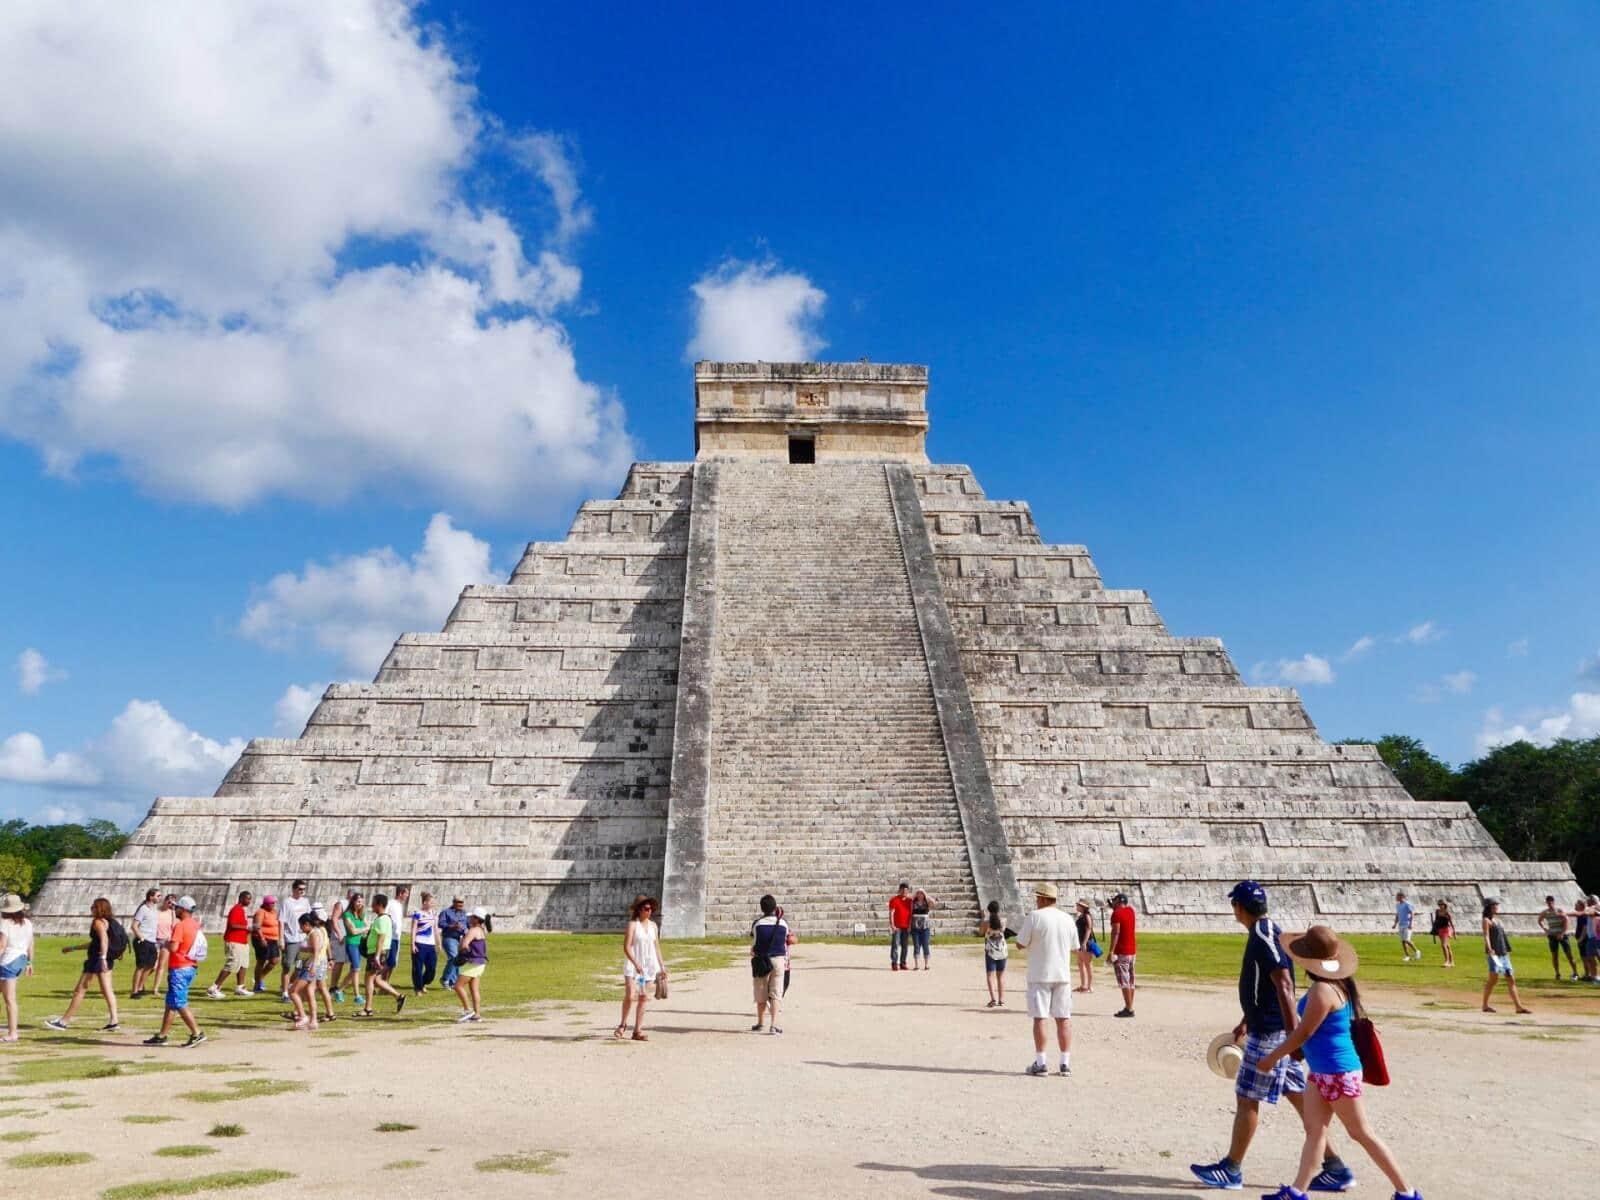 O Que Fazer em Riviera Maya no México: chichen itza